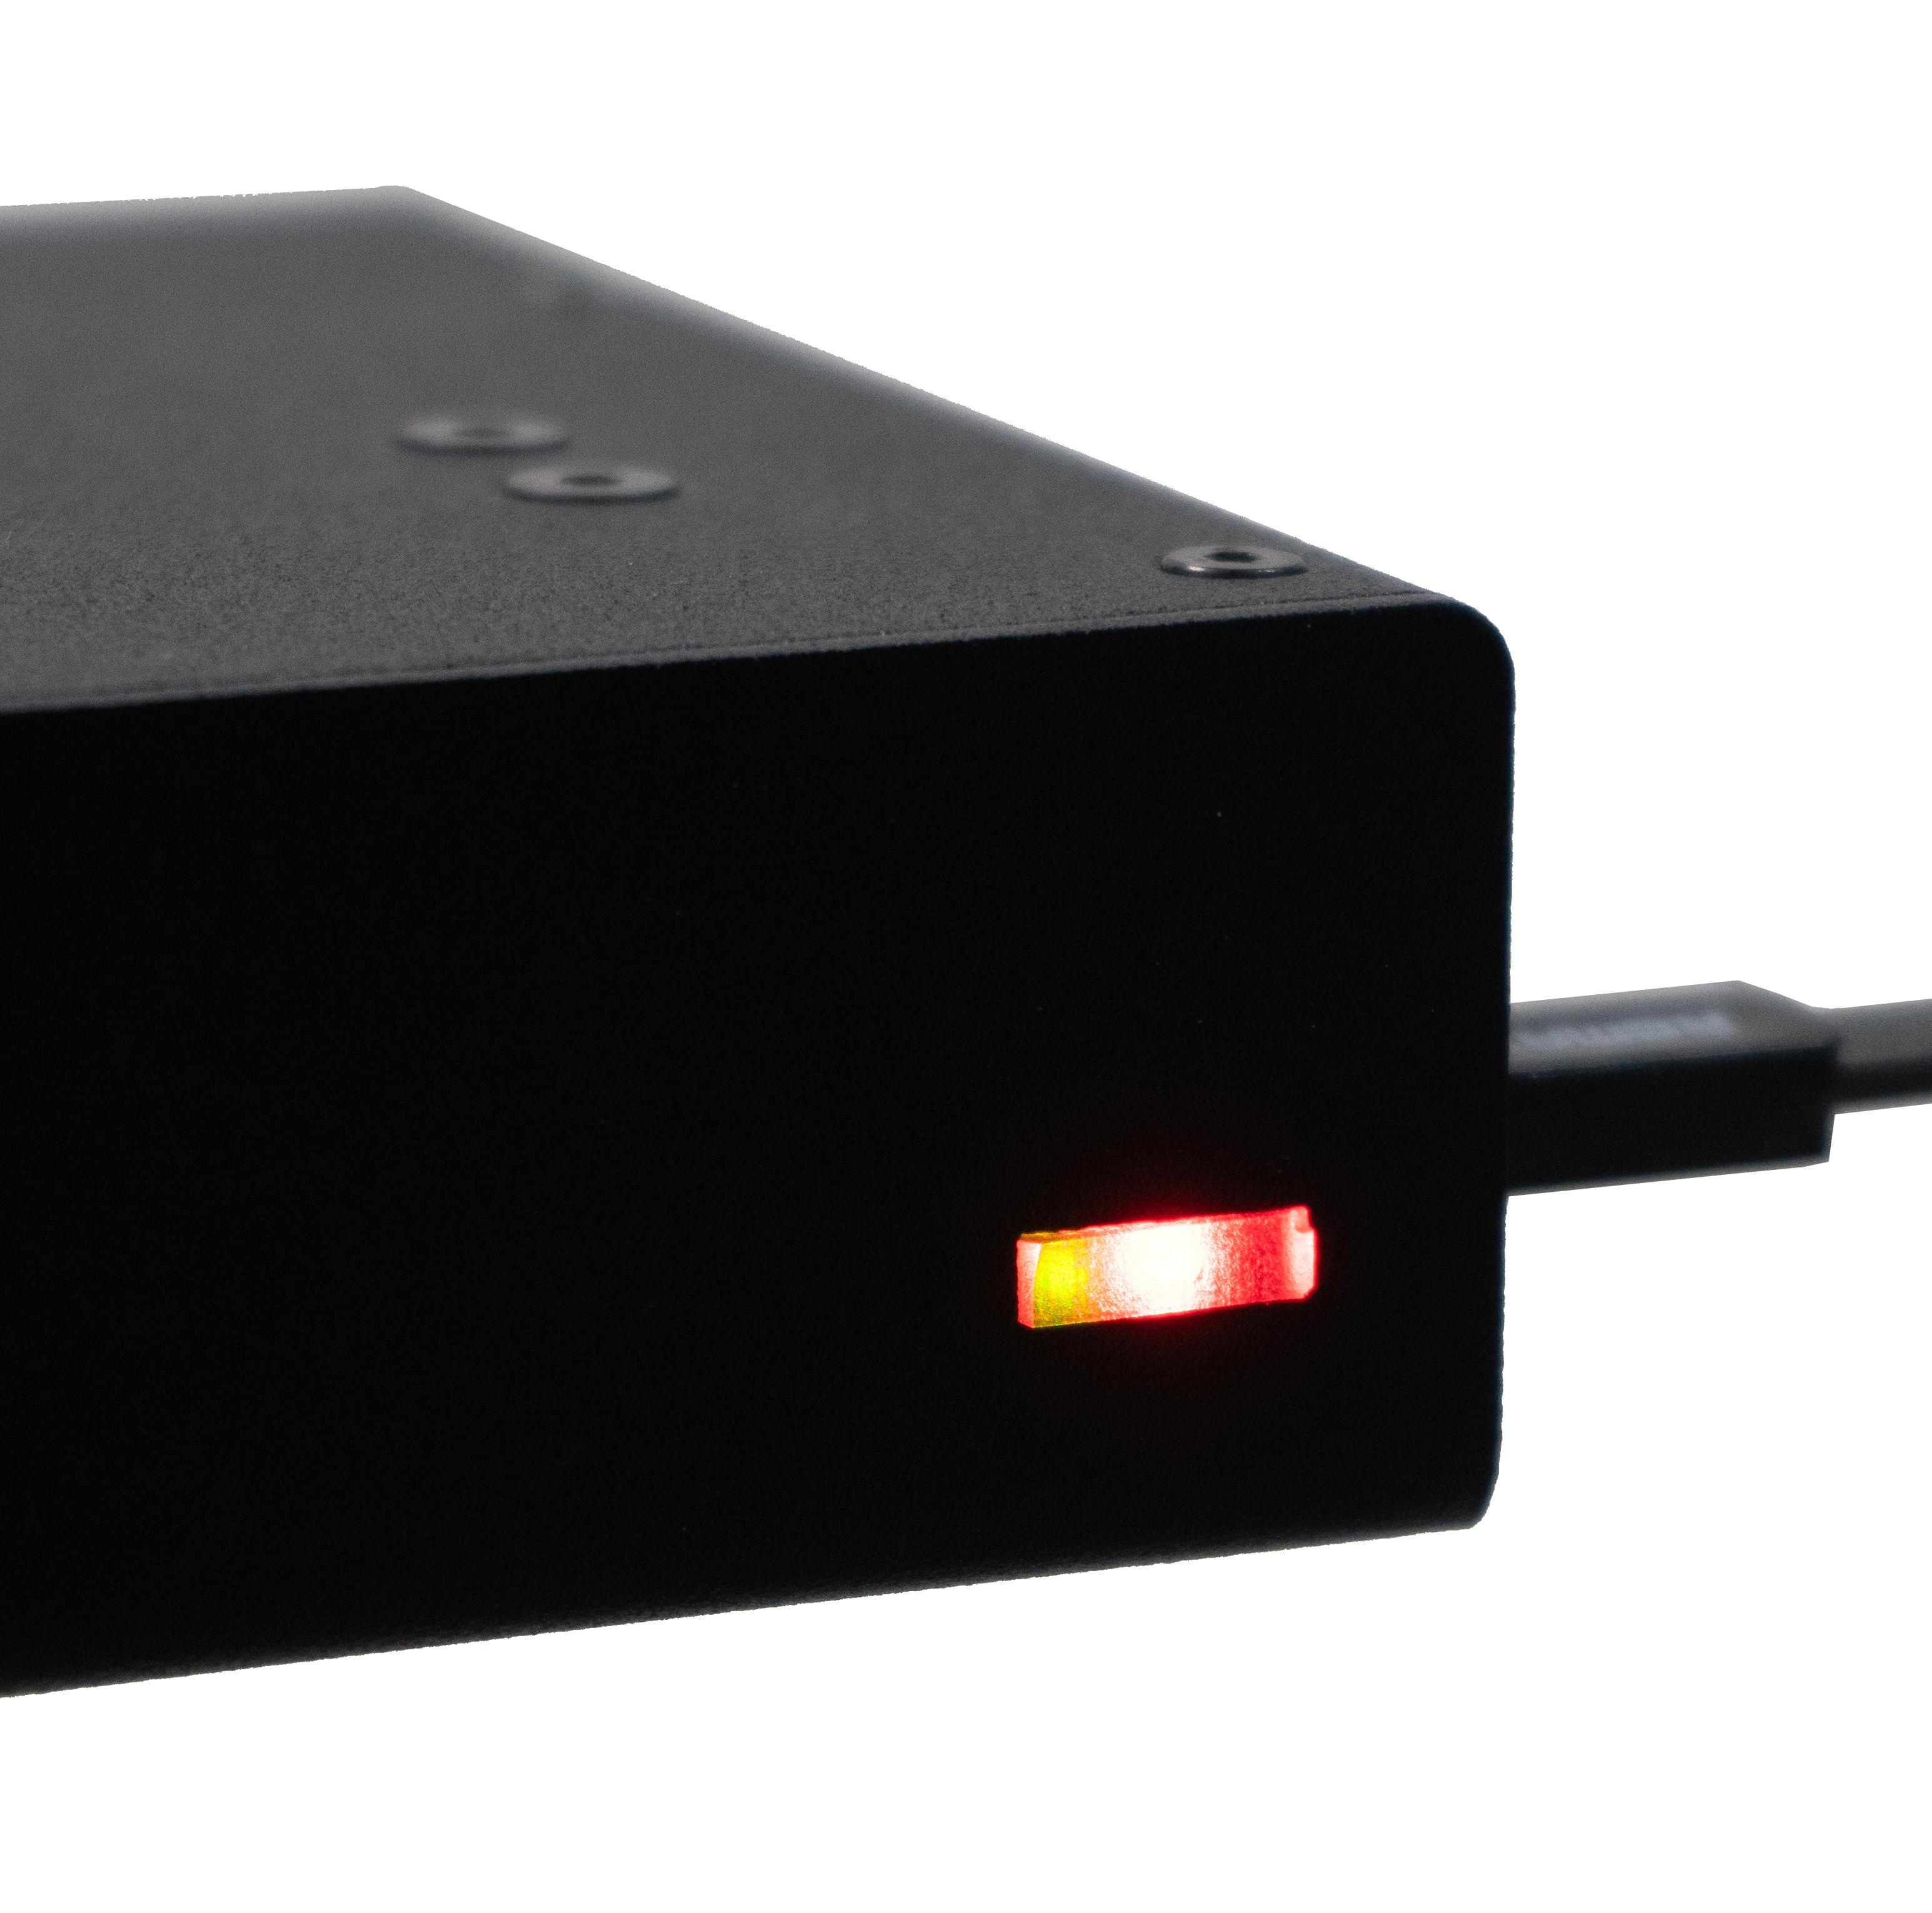 Тонкий клиент thinBox 3 WTWare